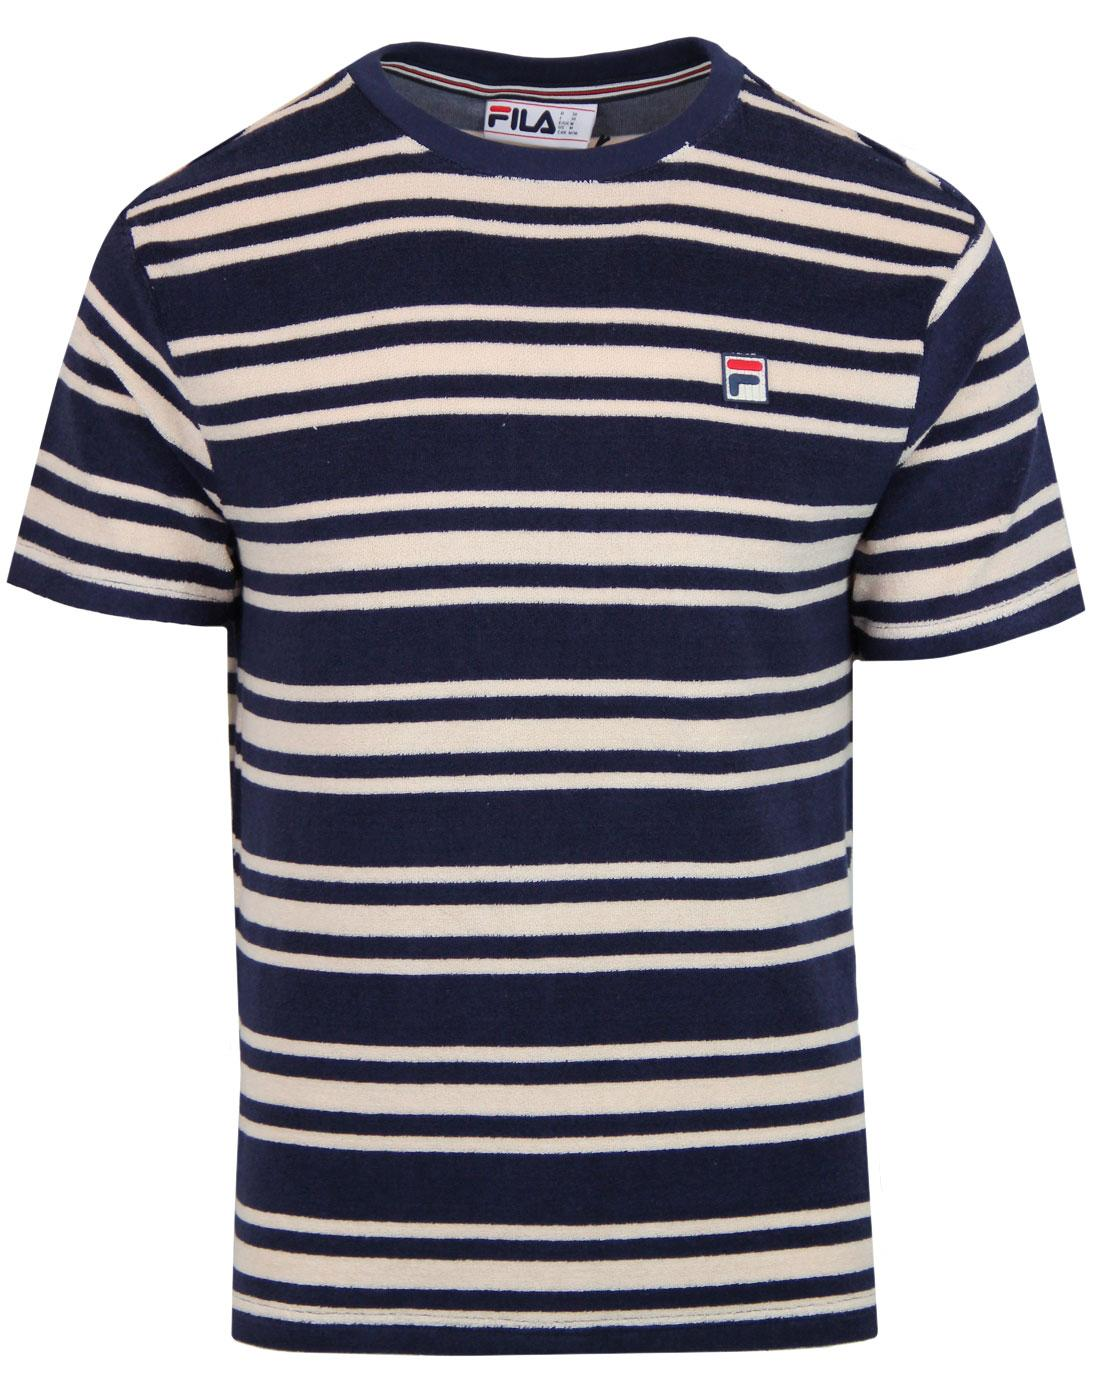 bae751fc05be7 FILA VINTAGE Alexandro Retro 1980s Terry Towelling T-shirt